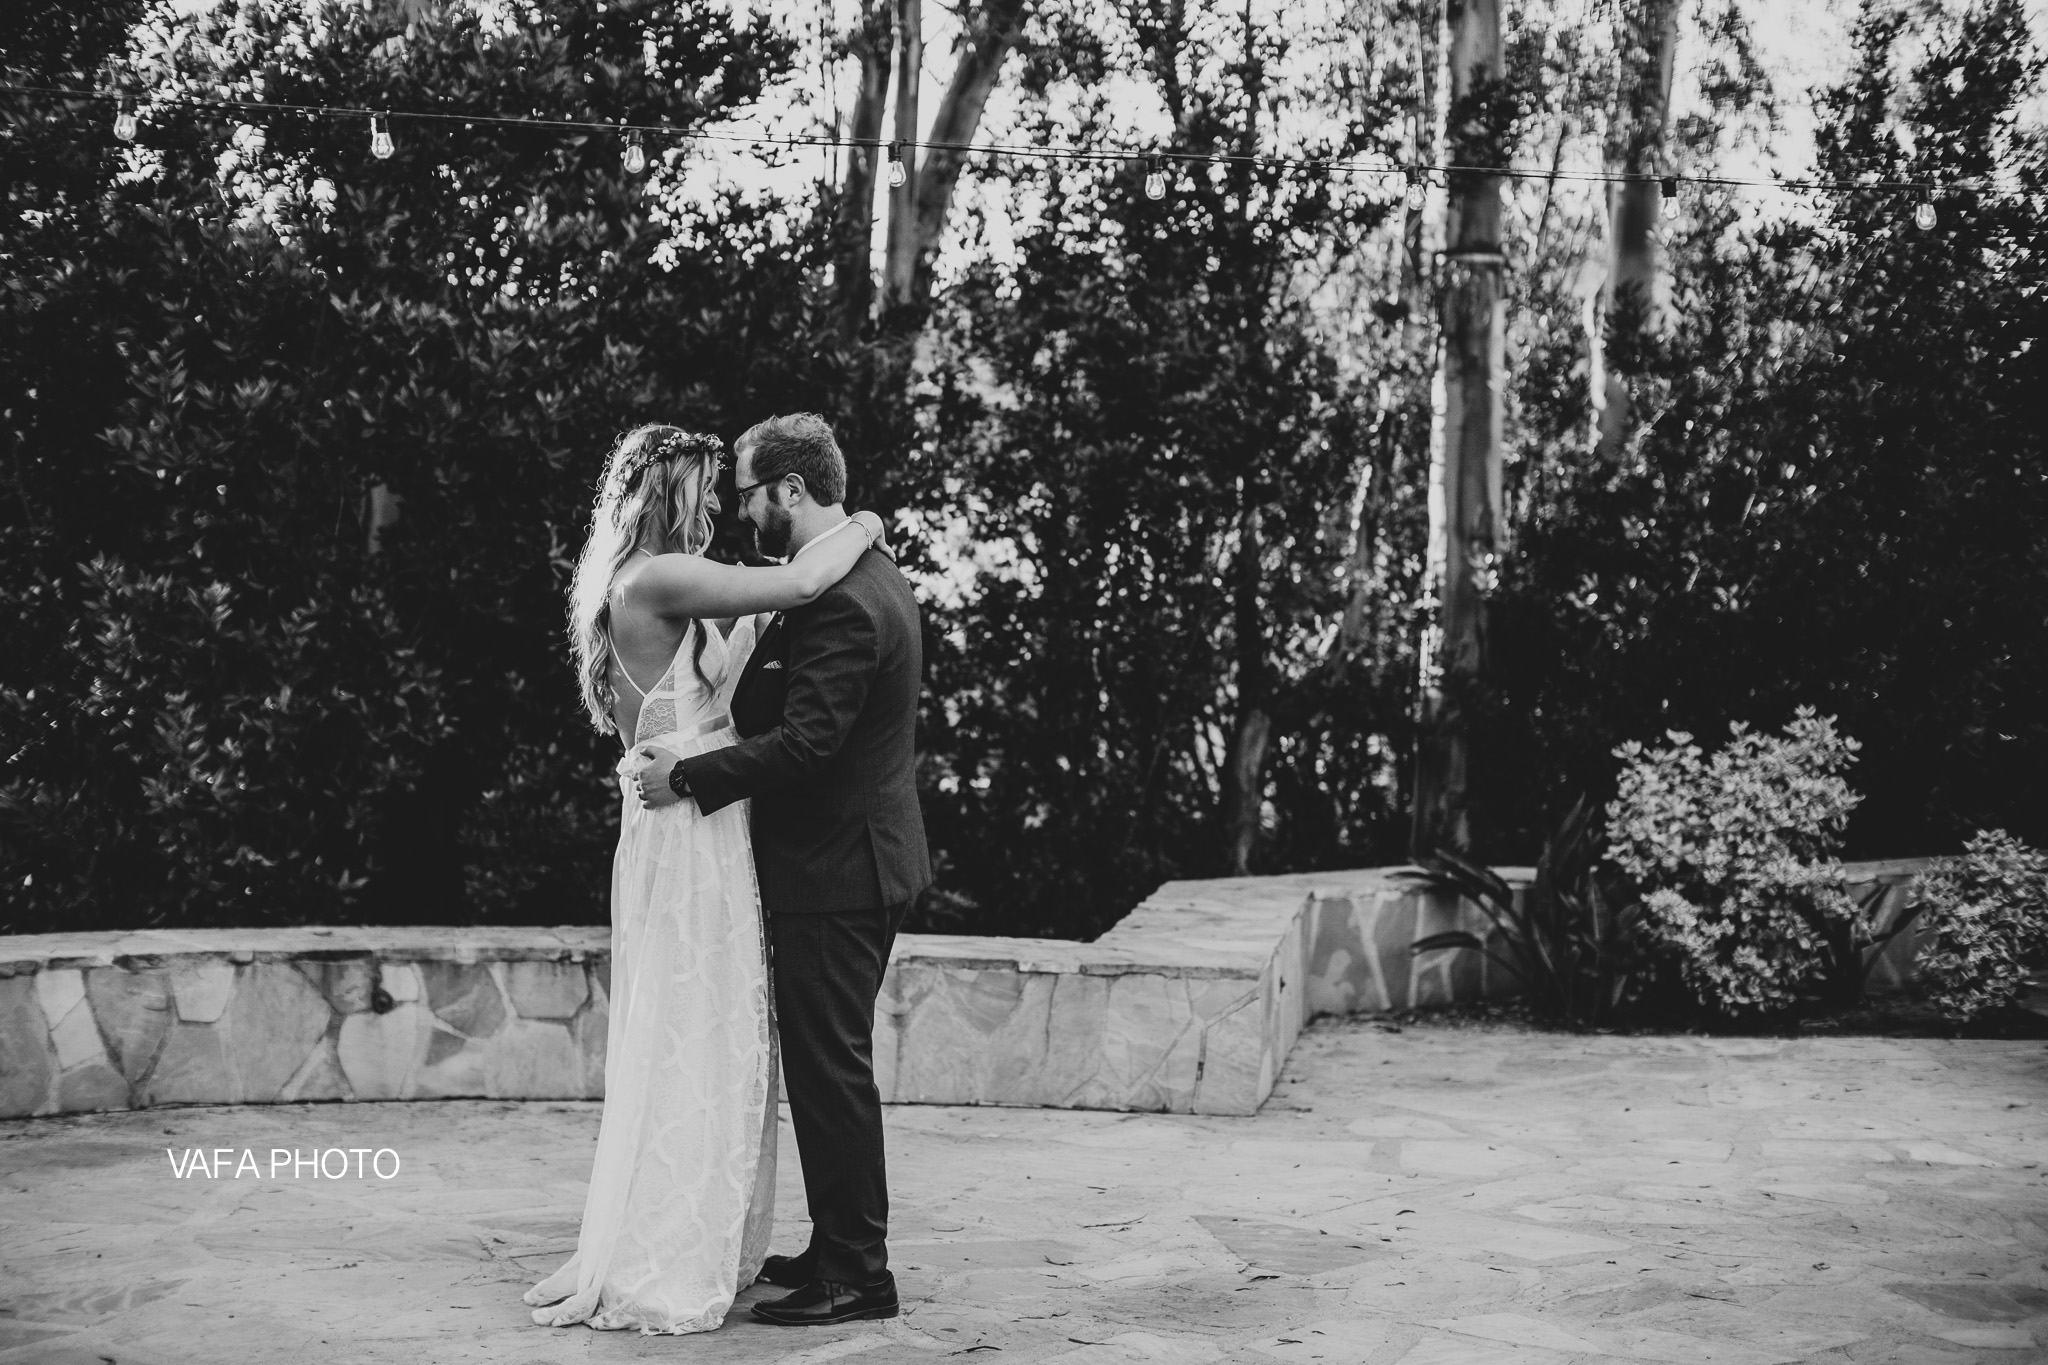 Leo-Carrillo-Ranch-Wedding-Lauren-Mike-Vafa-Photo-925.jpg